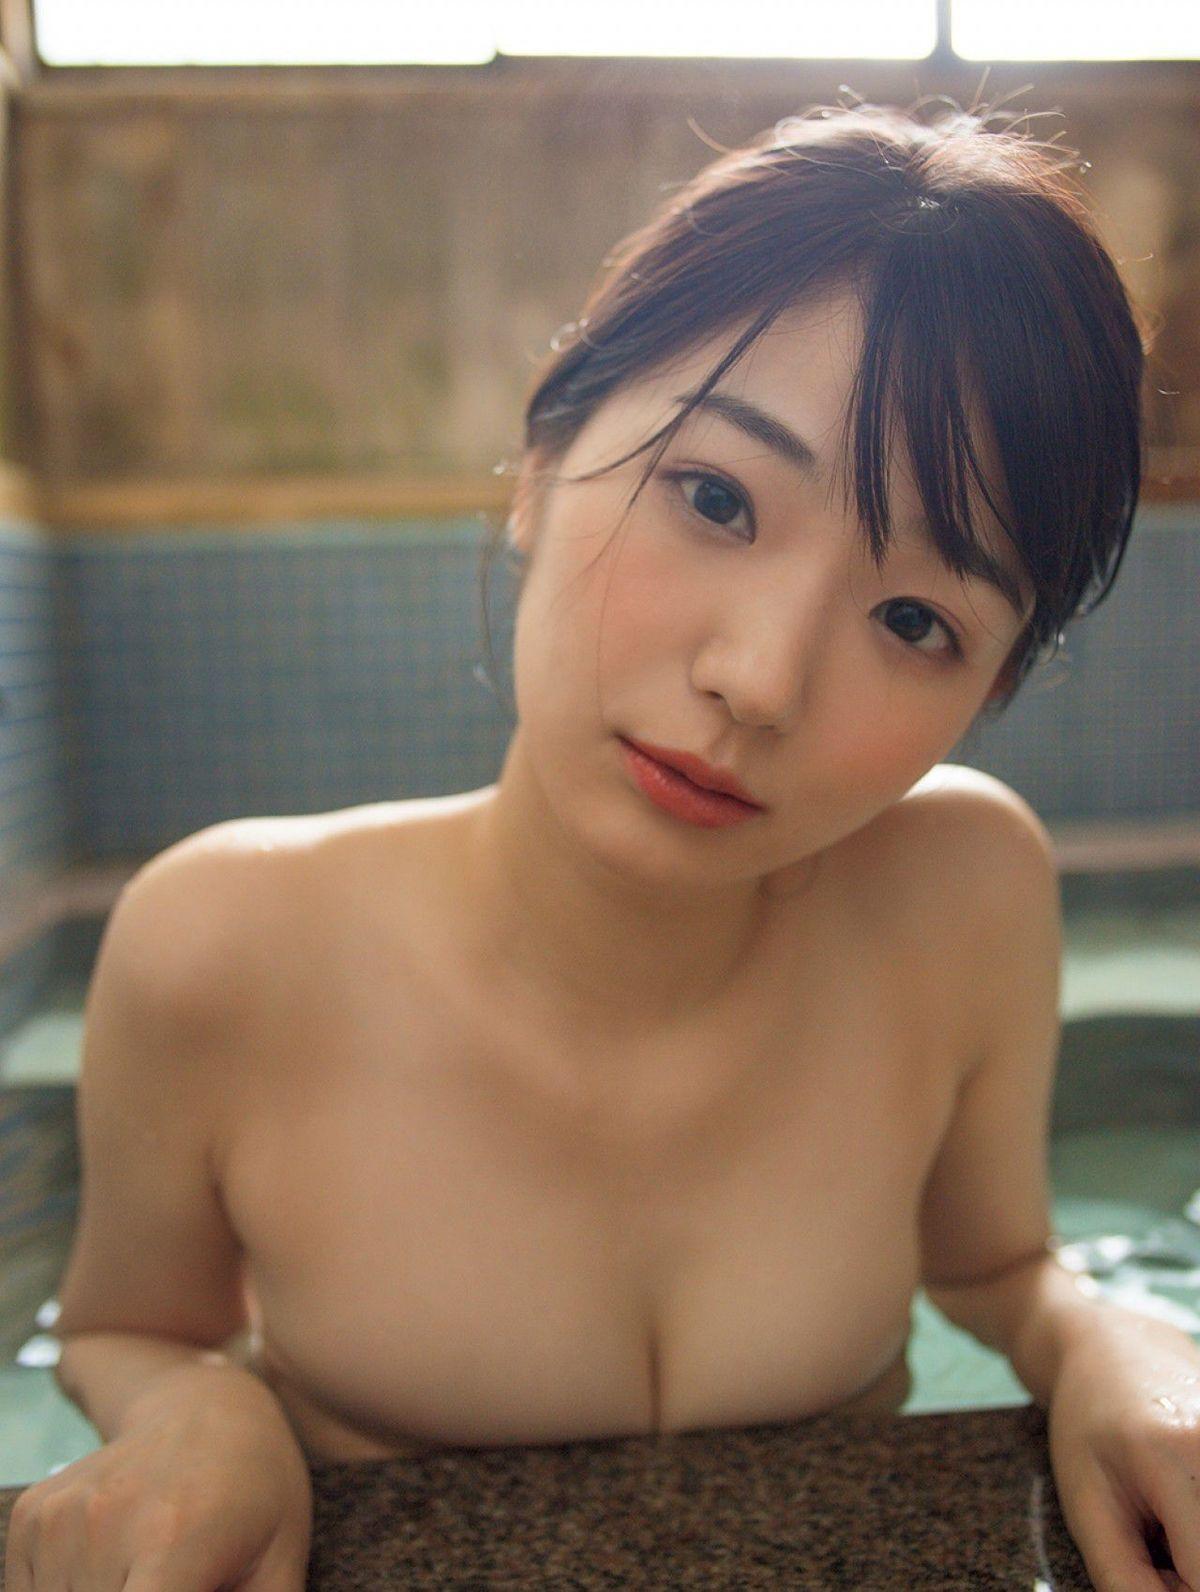 [FRIDAY] 長谷川かすみの 《「Eカップ」今田耕司が「今、いちばん会いたい美女」と指名した話題美女の初水着(動画付き)》写真10